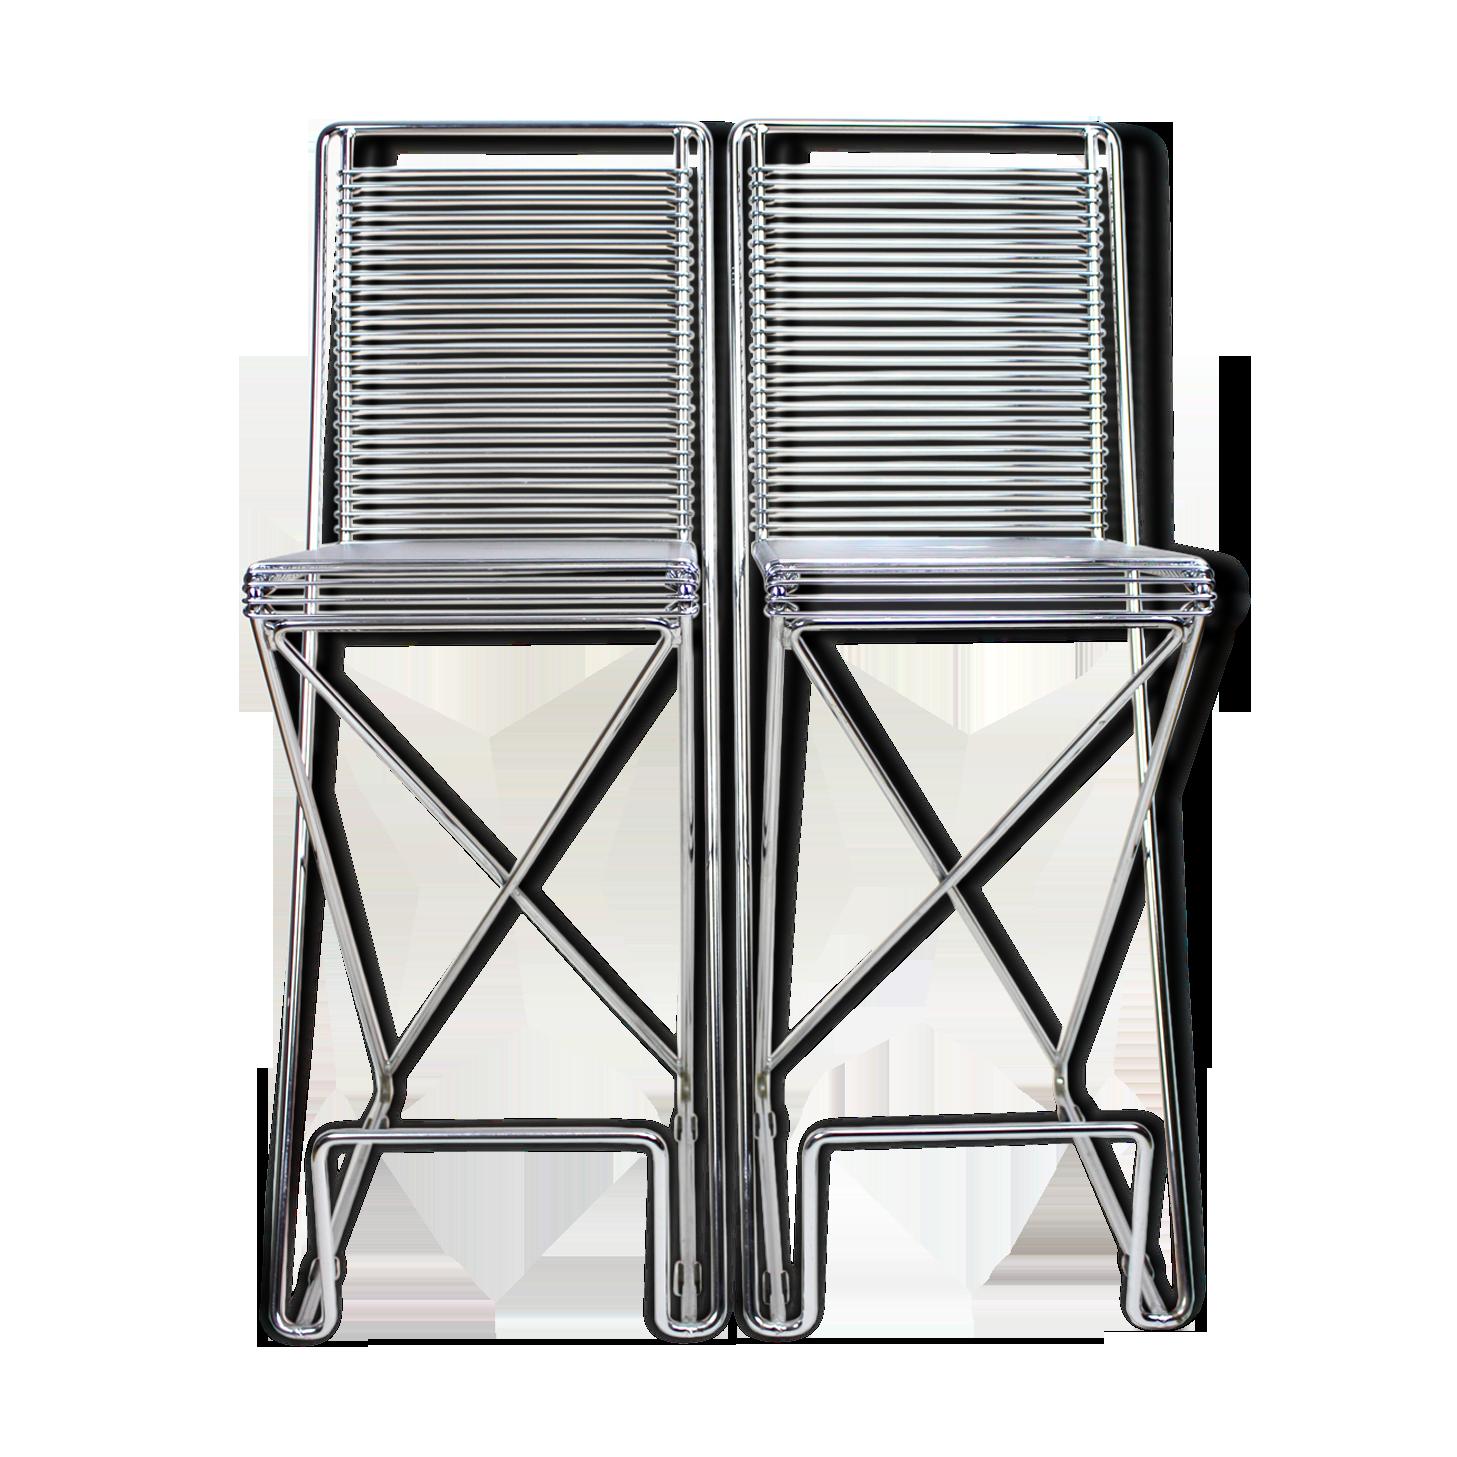 Anself Foldable Camping Kitchen Unit with Windshield Aluminium